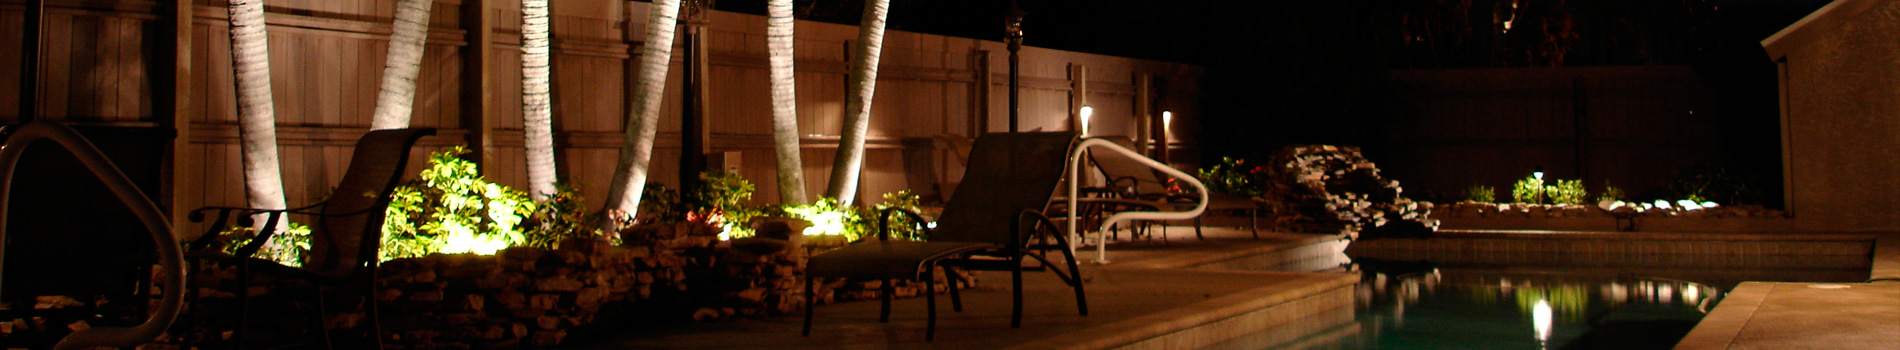 Lumipro iluminacion de exterior en monterrey focos para - Iluminacion led exterior jardin ...